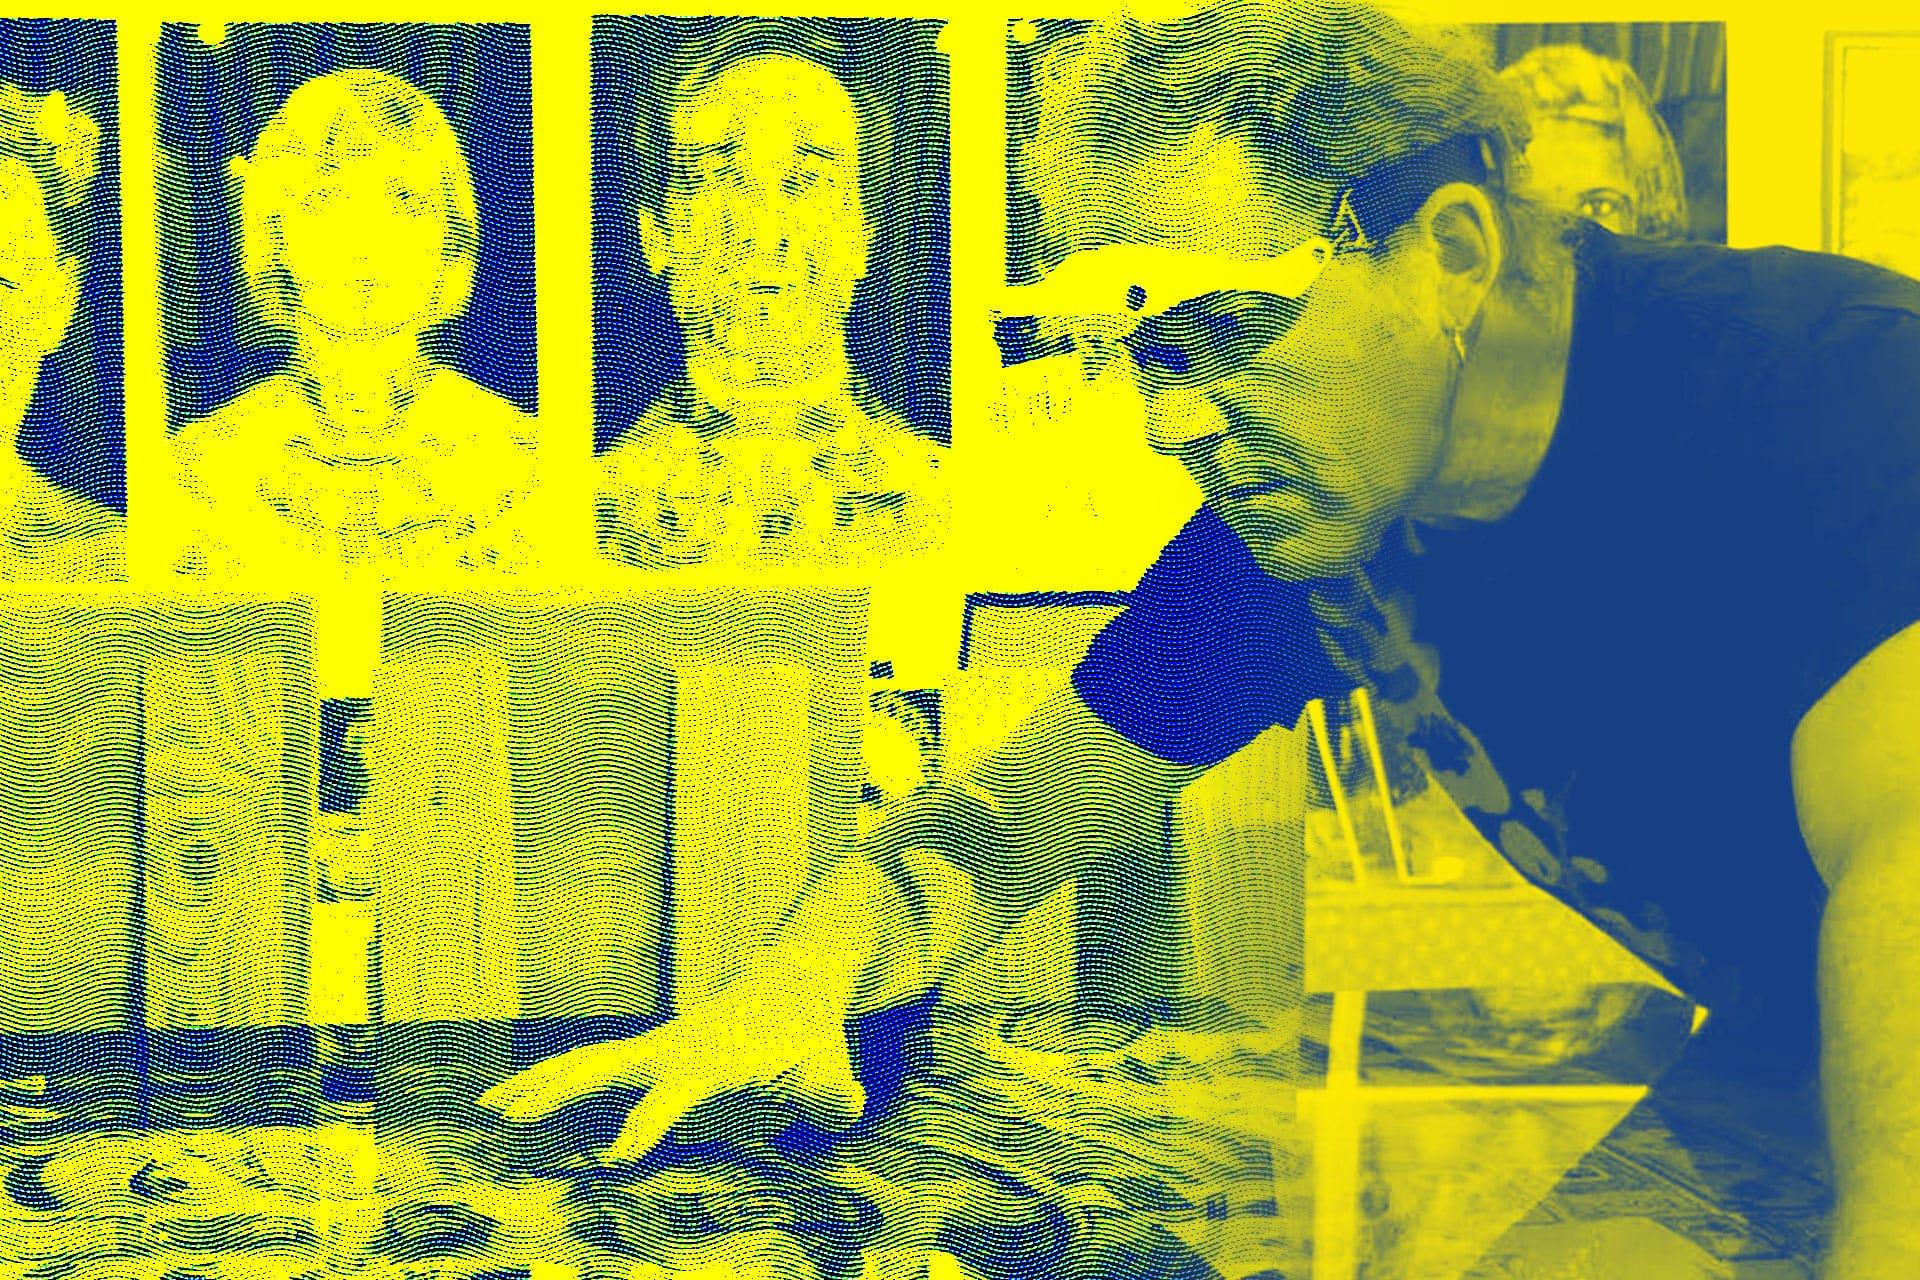 Philippe Assalit: A kaleidoscope of the human nature